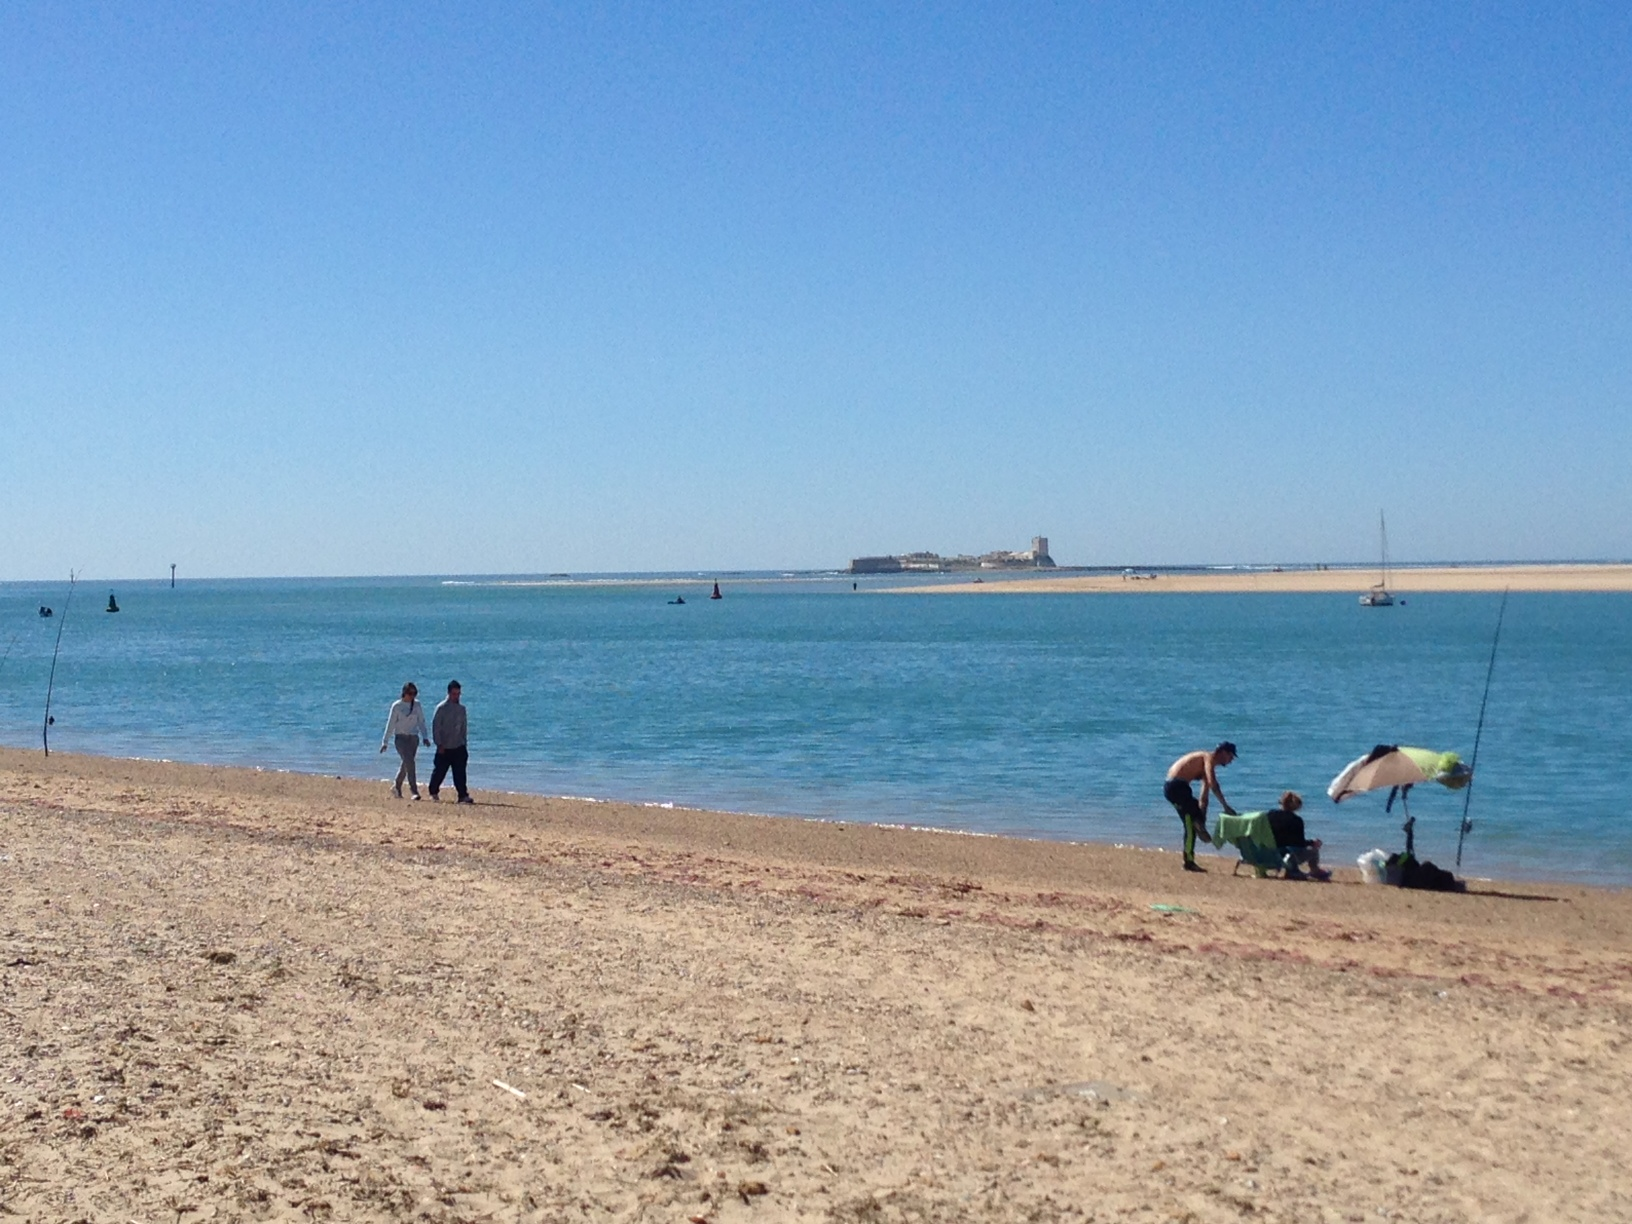 playa sancti petri 5